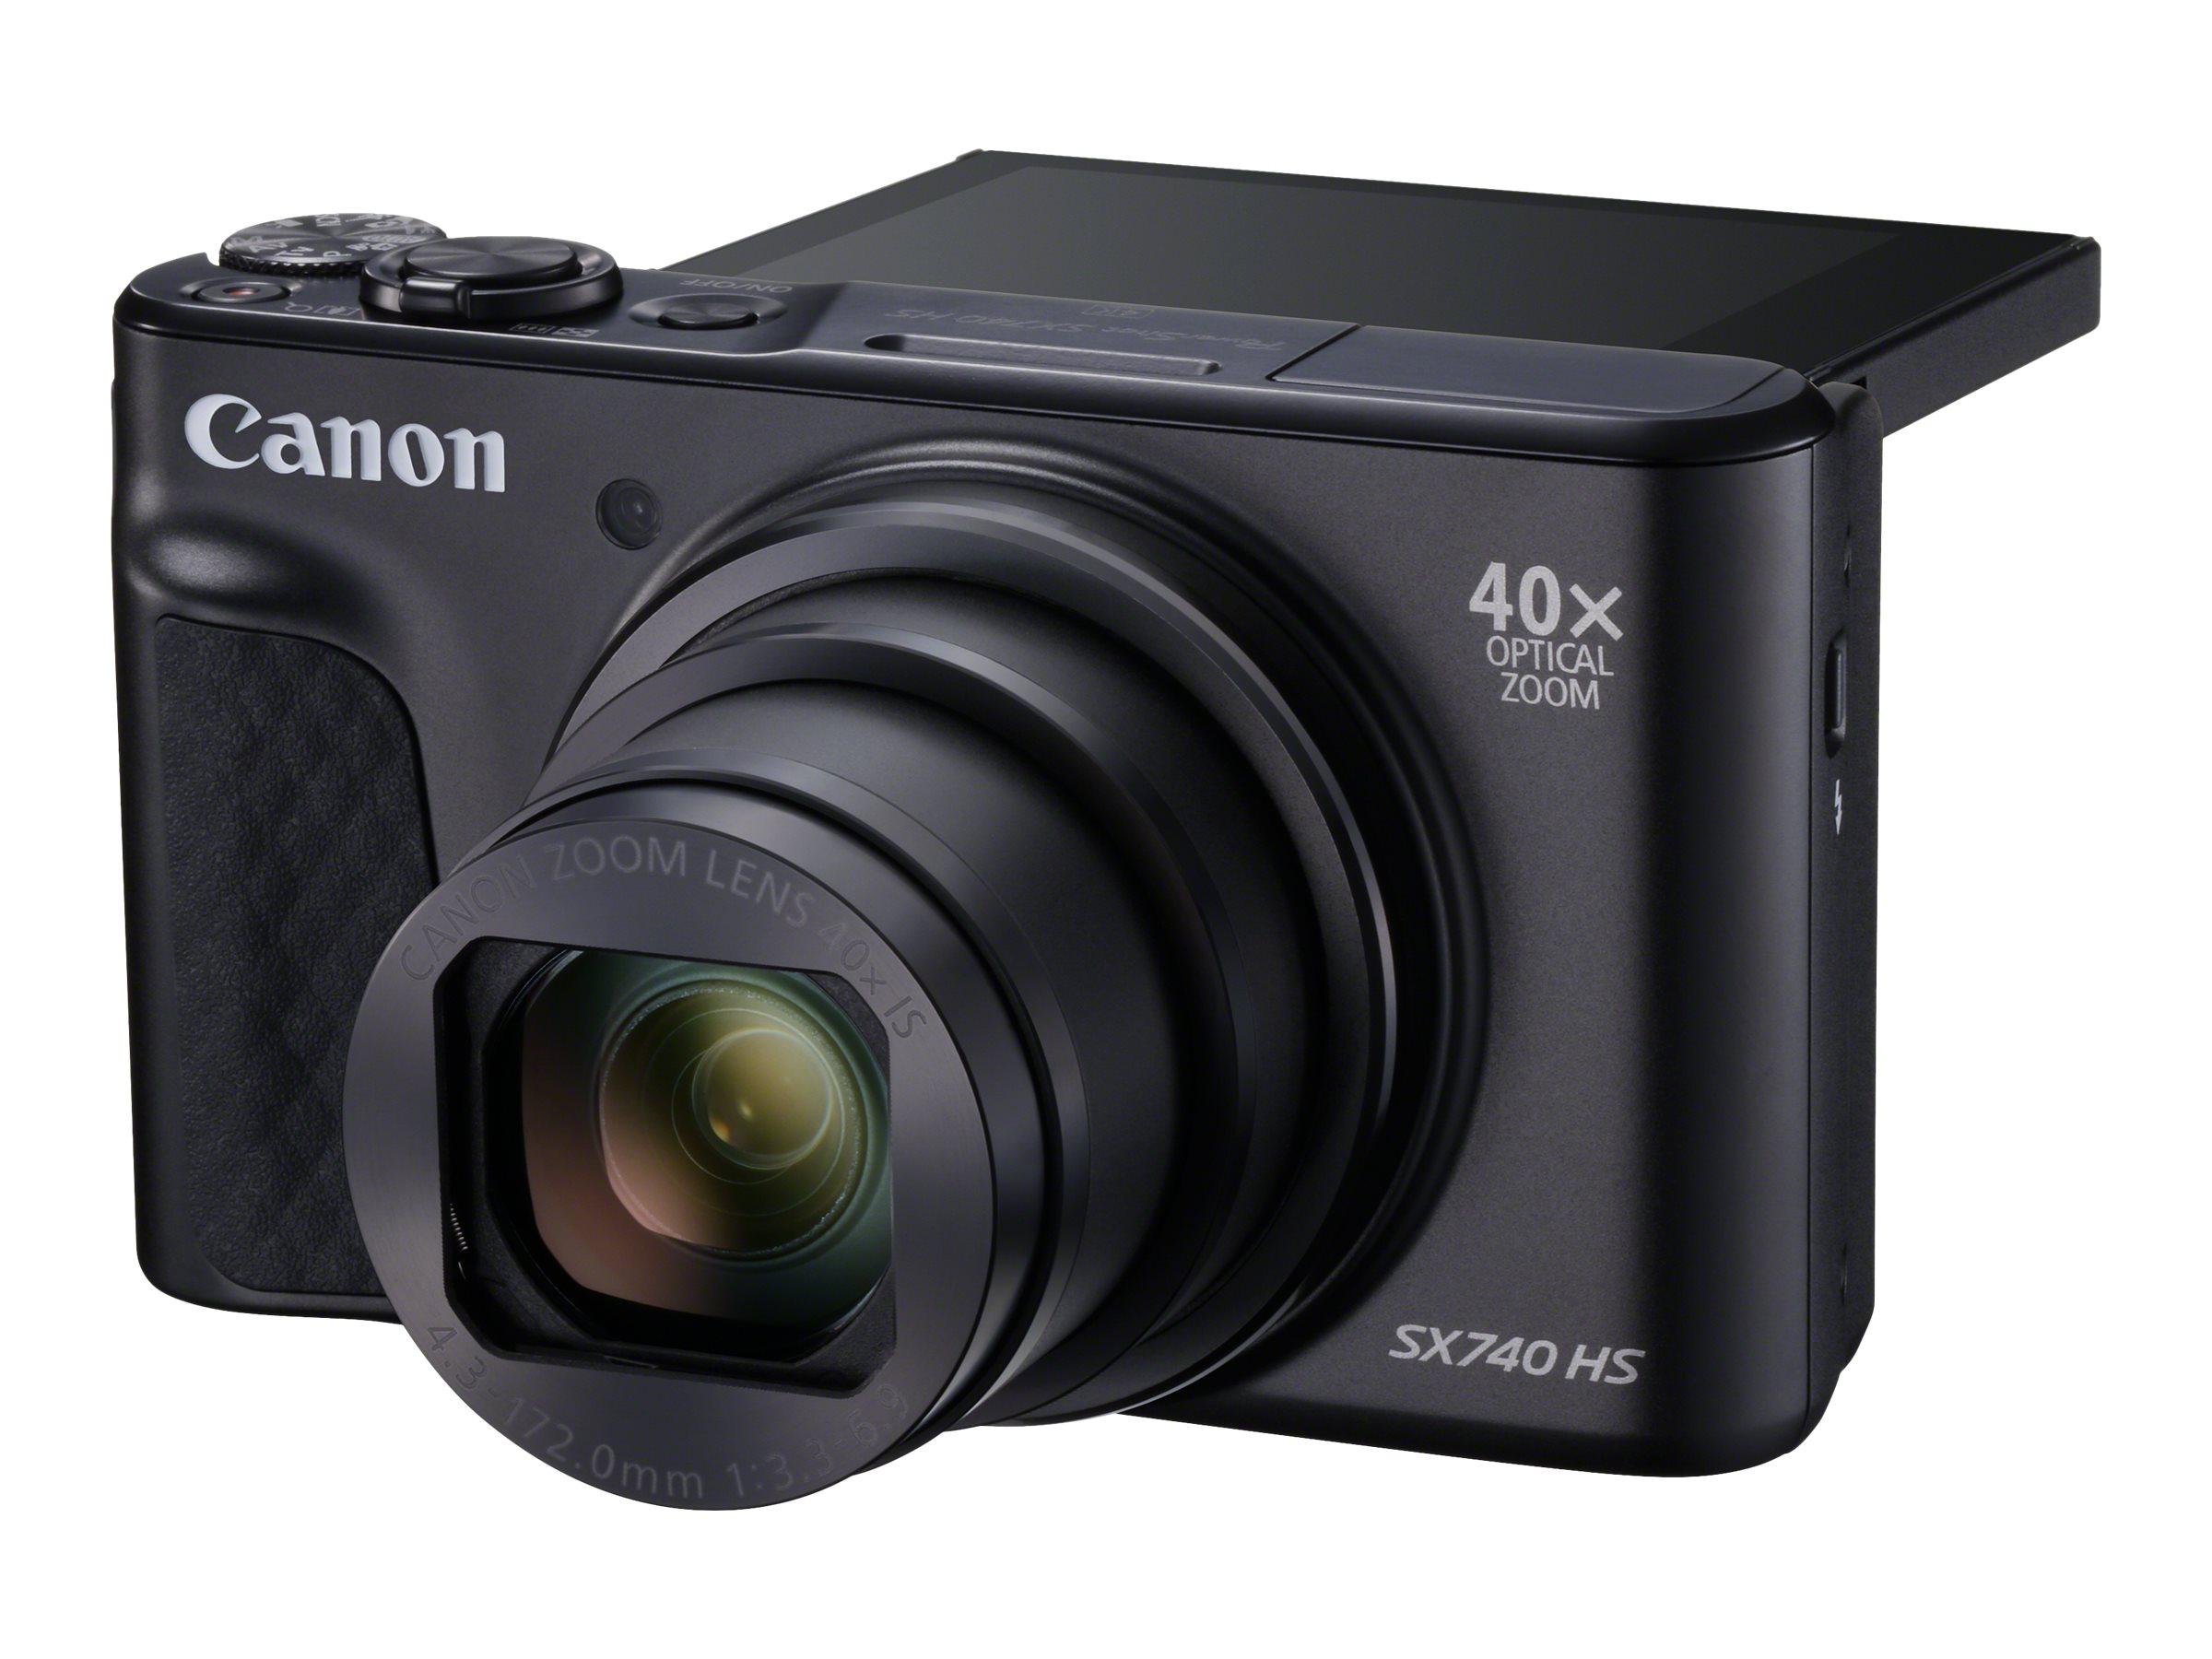 Canon PowerShot SX740 HS - Digitalkamera - Kompaktkamera - 20.3 MPix - 4K / 30 BpS - 40x optischer Zoom